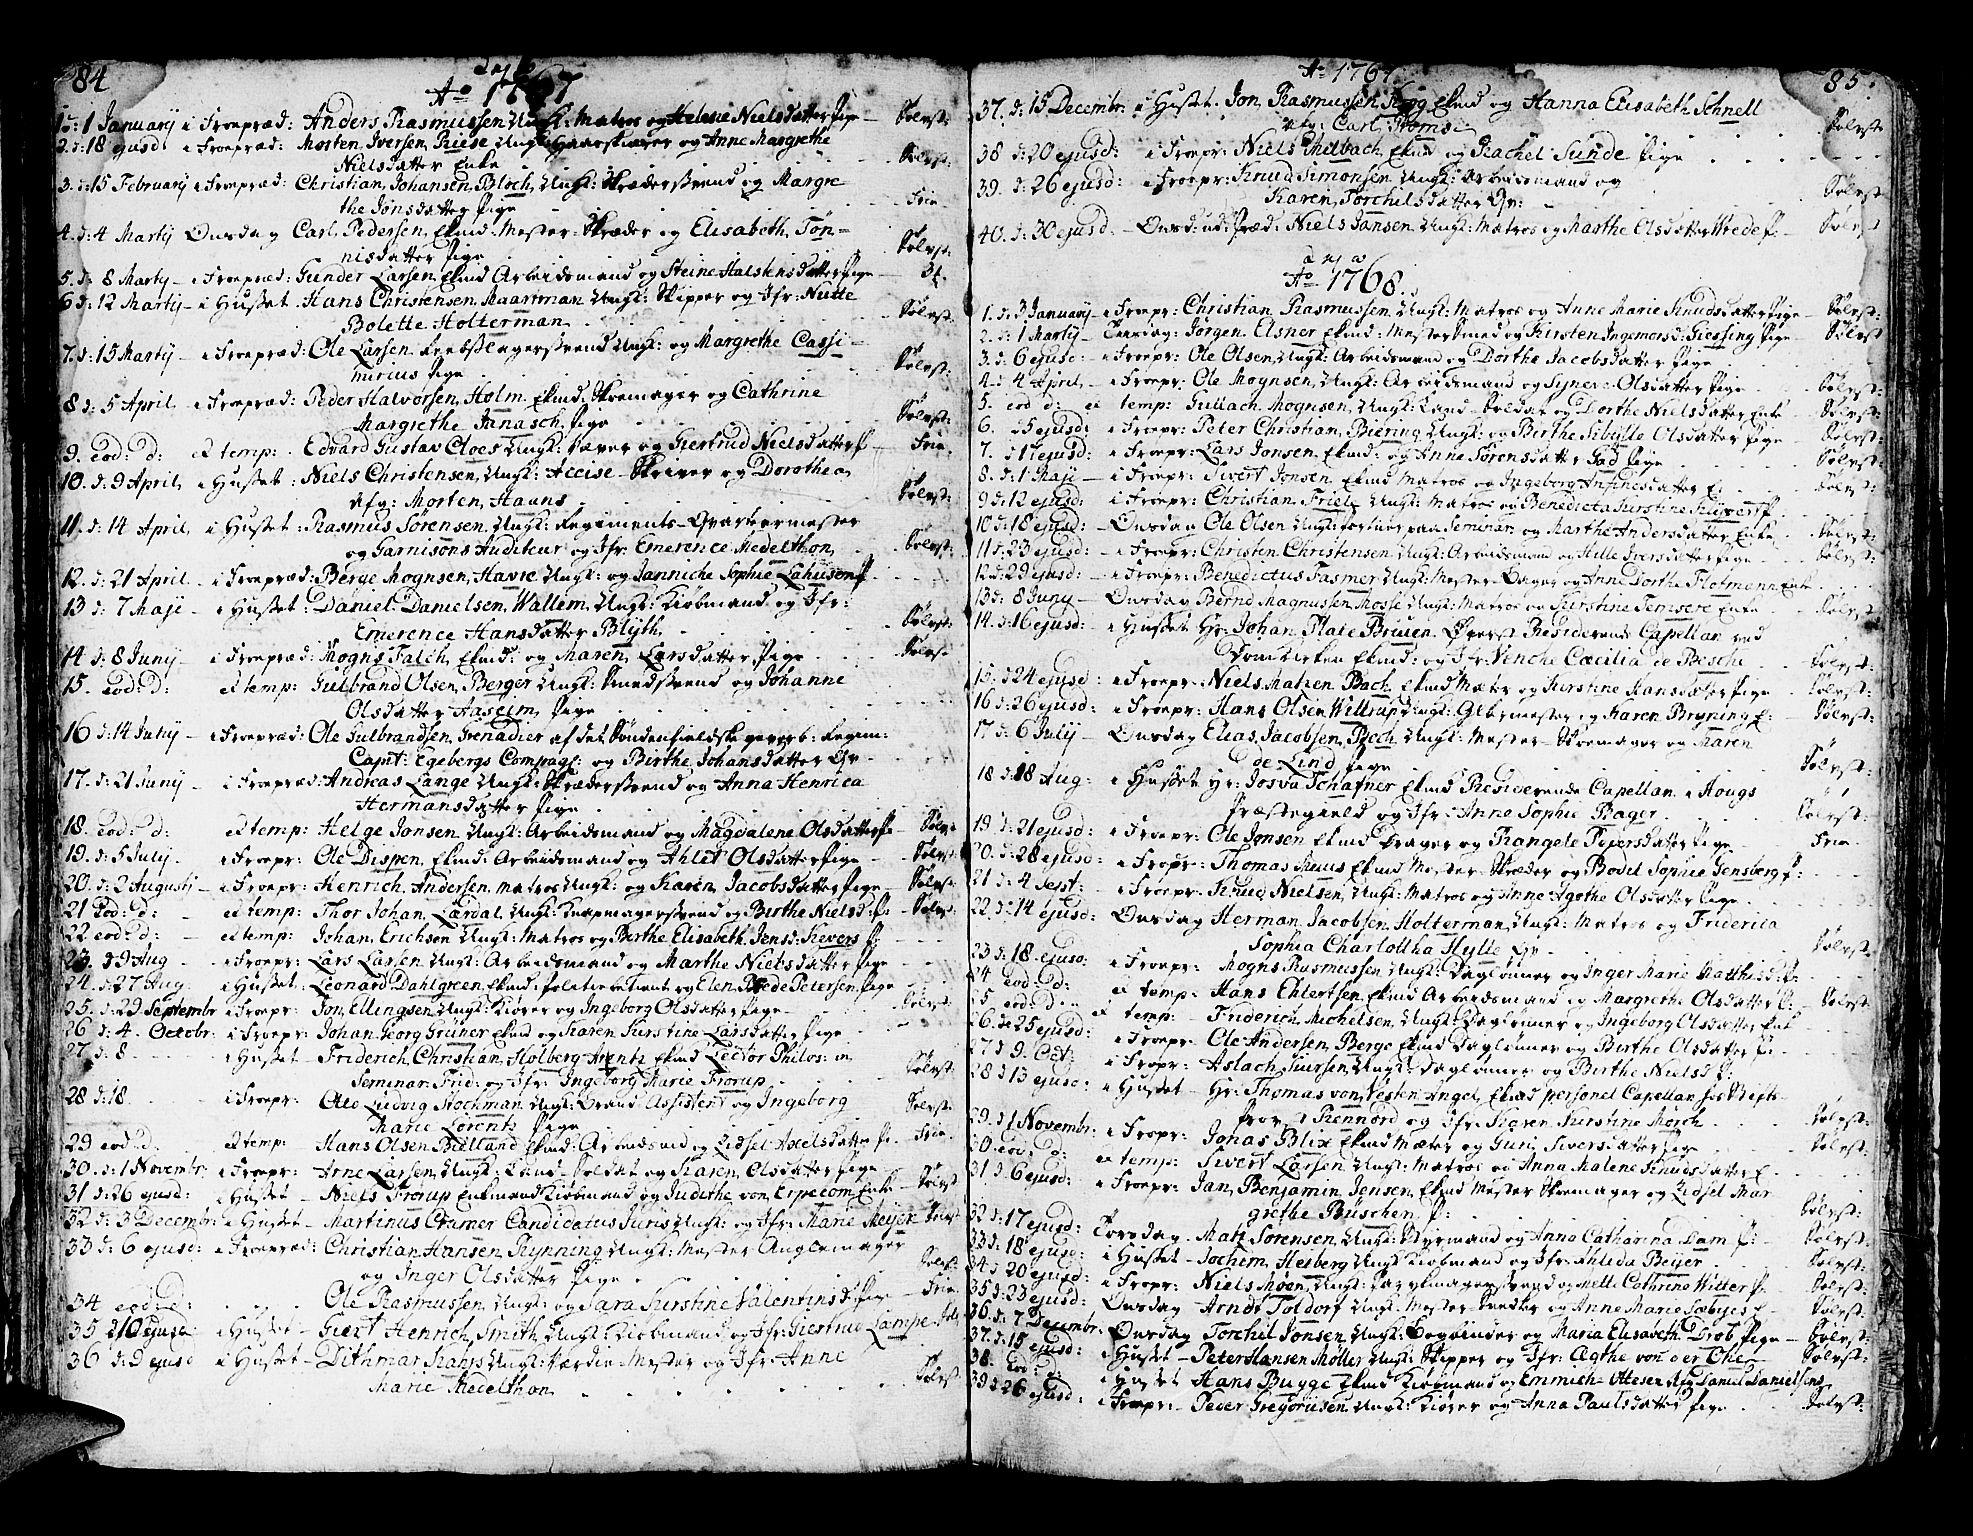 SAB, Domkirken Sokneprestembete, H/Haa/L0007: Ministerialbok nr. A 7, 1725-1826, s. 84-85